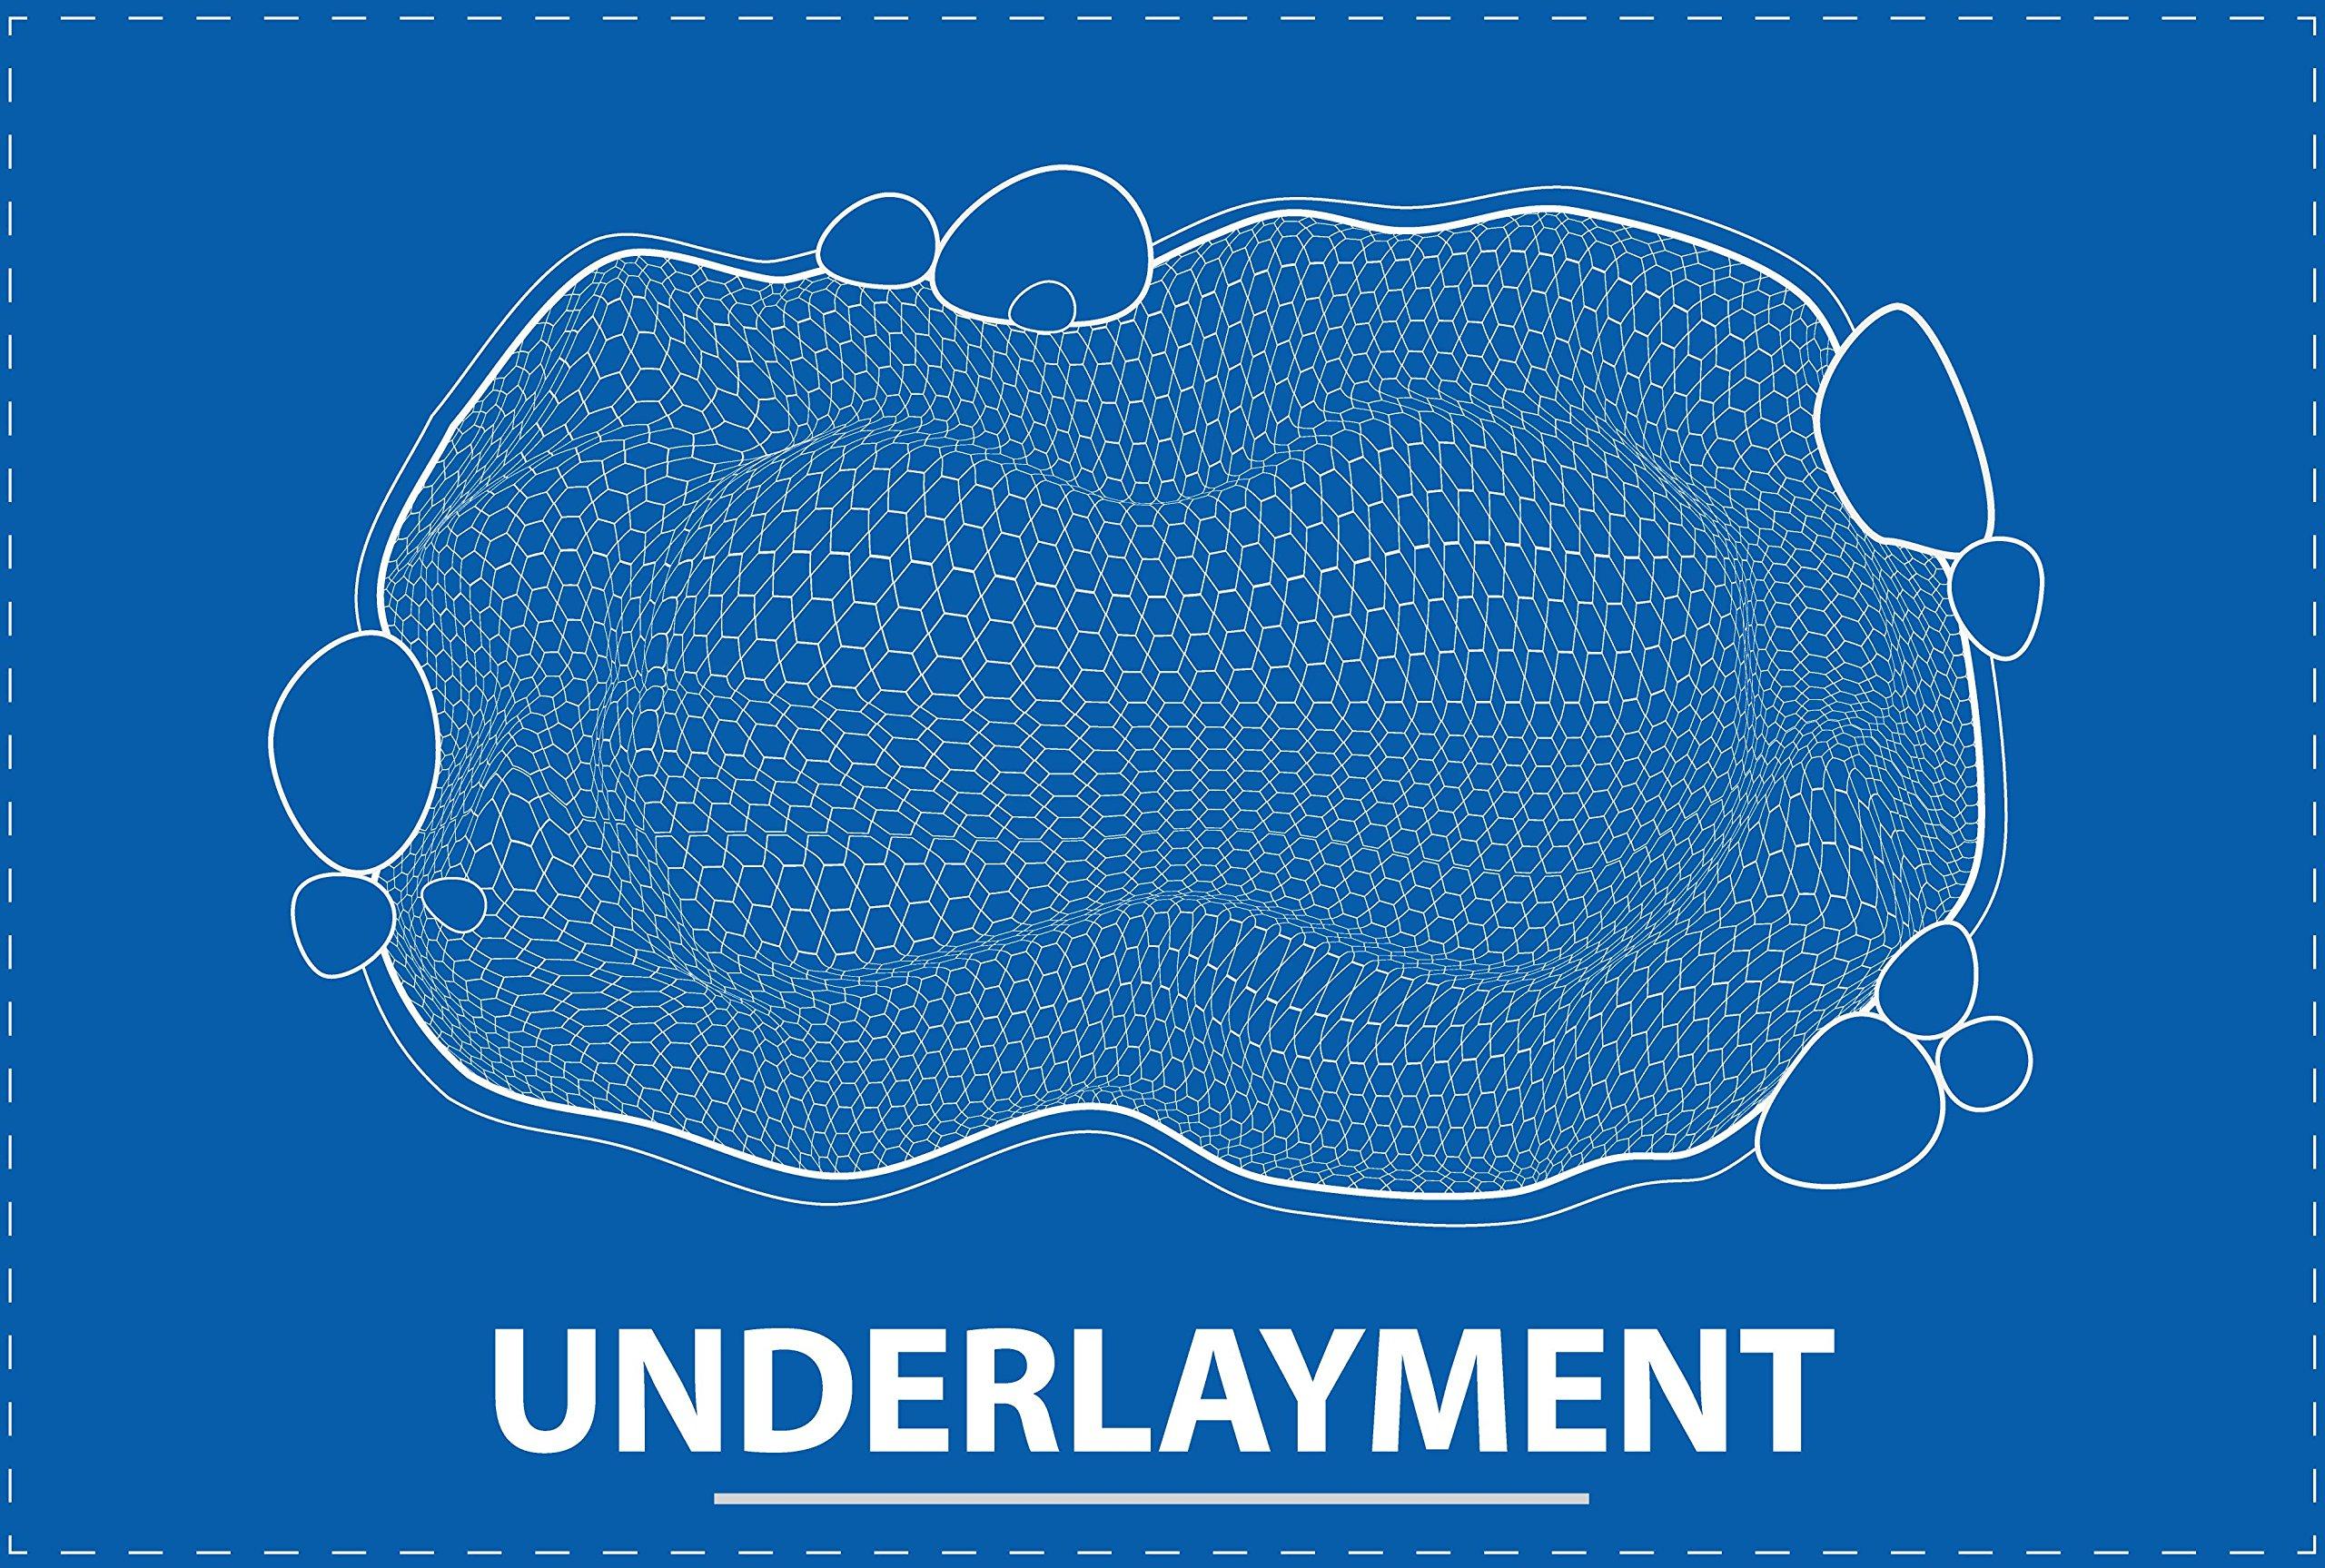 20 ft. x 25 ft. UnderGuard Geotextile Underlayment by UnderGuard